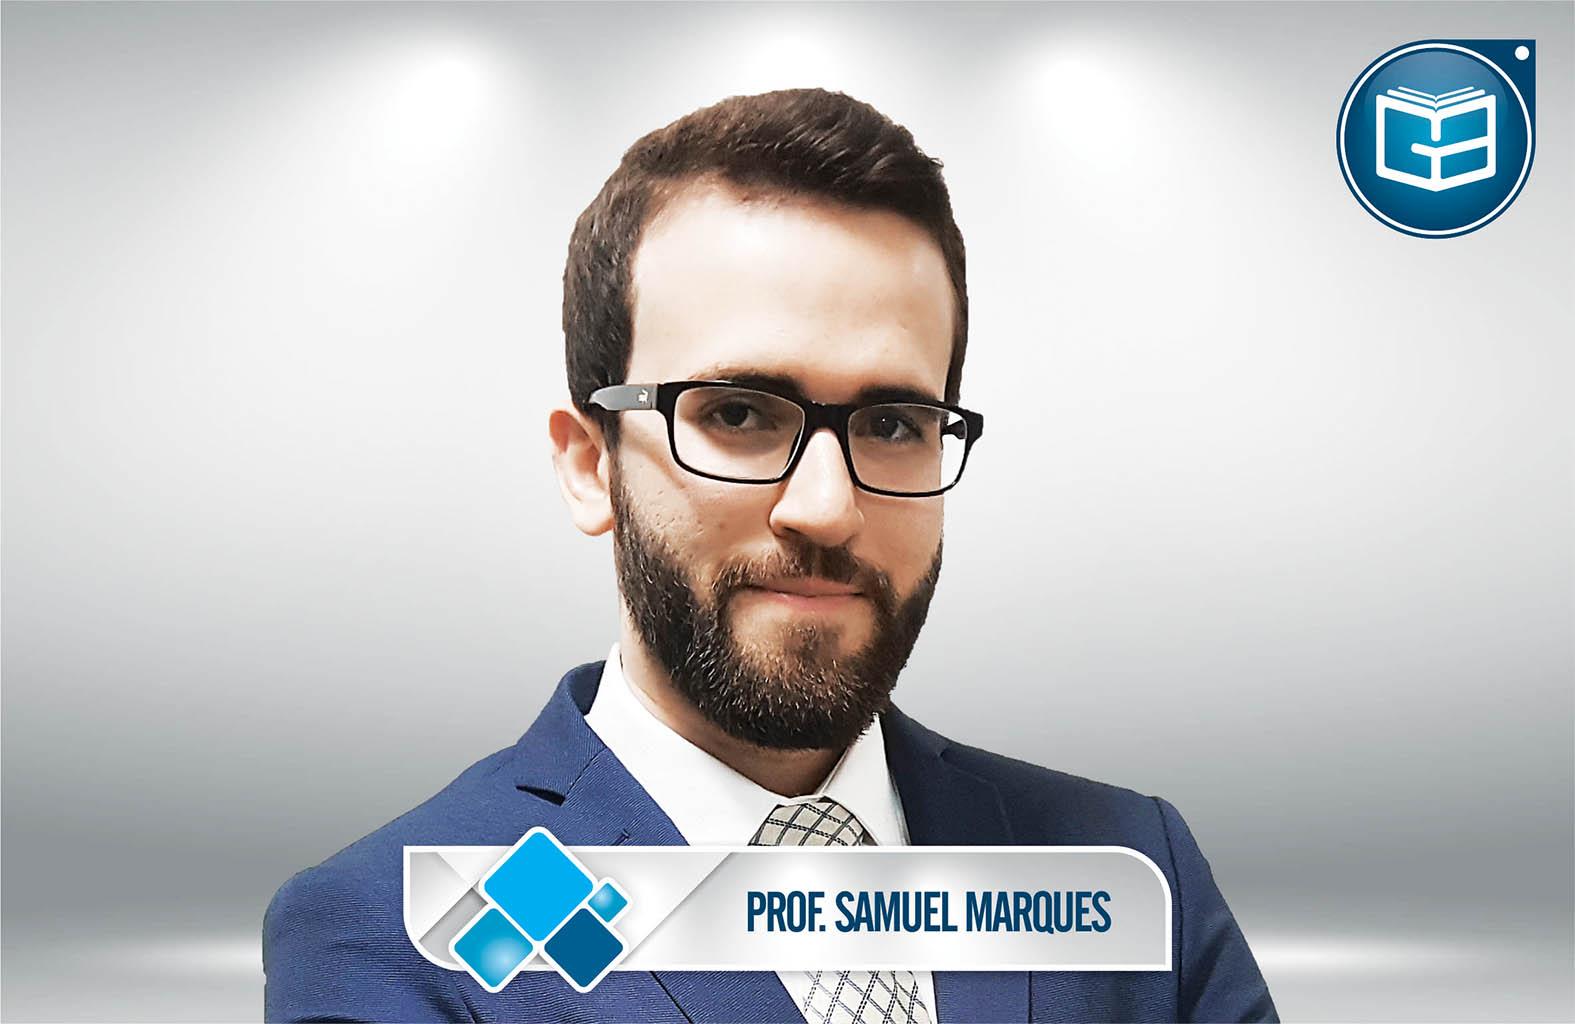 Departamento Penitenciário Nacional - DEPEN - Professor Samuel Marques